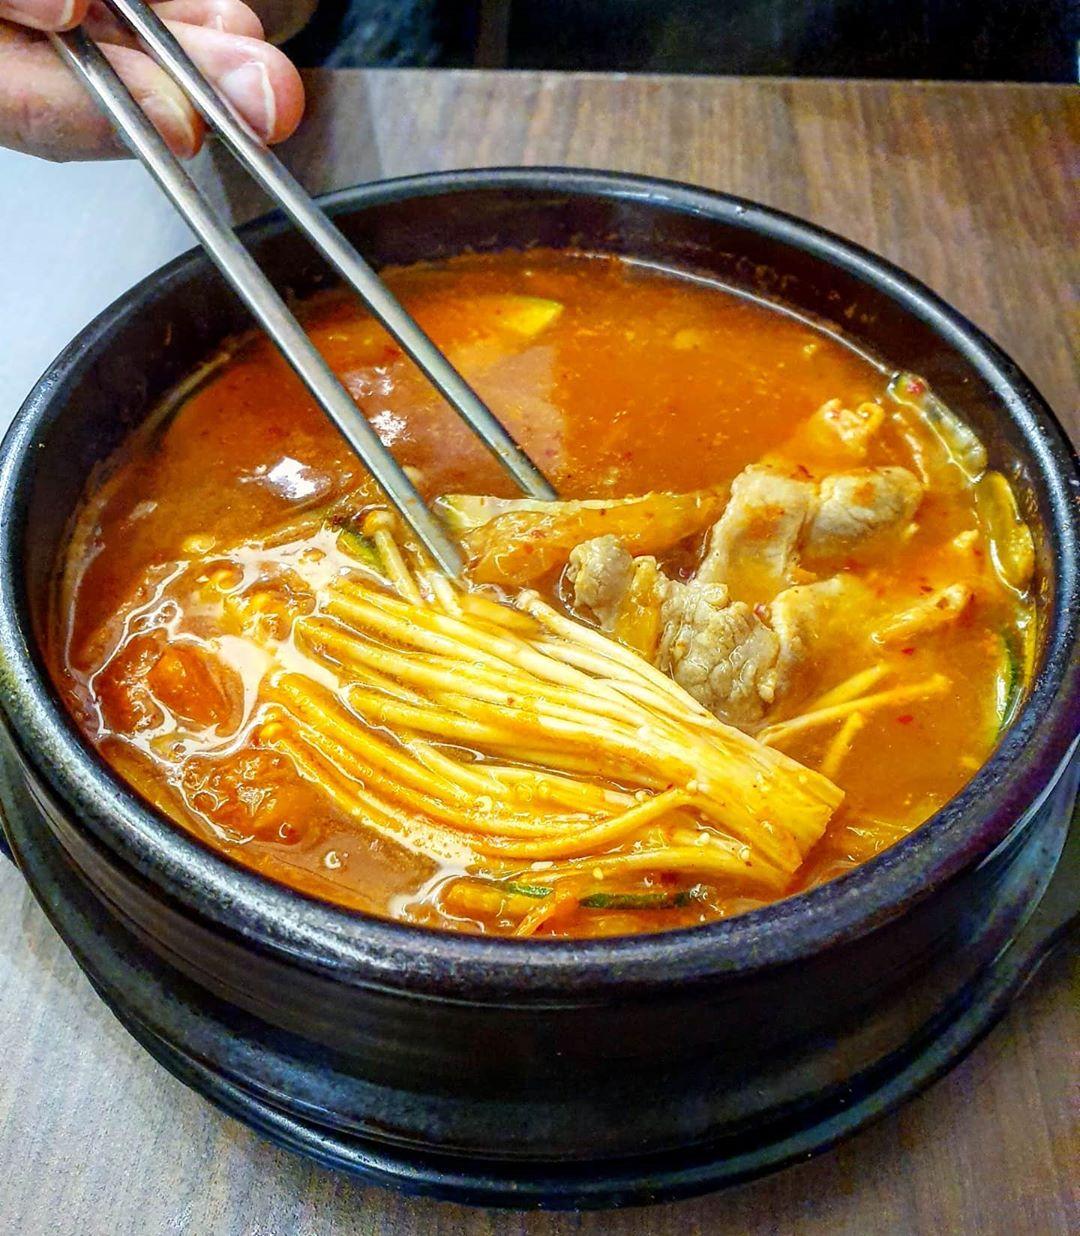 Hongdae Oppa